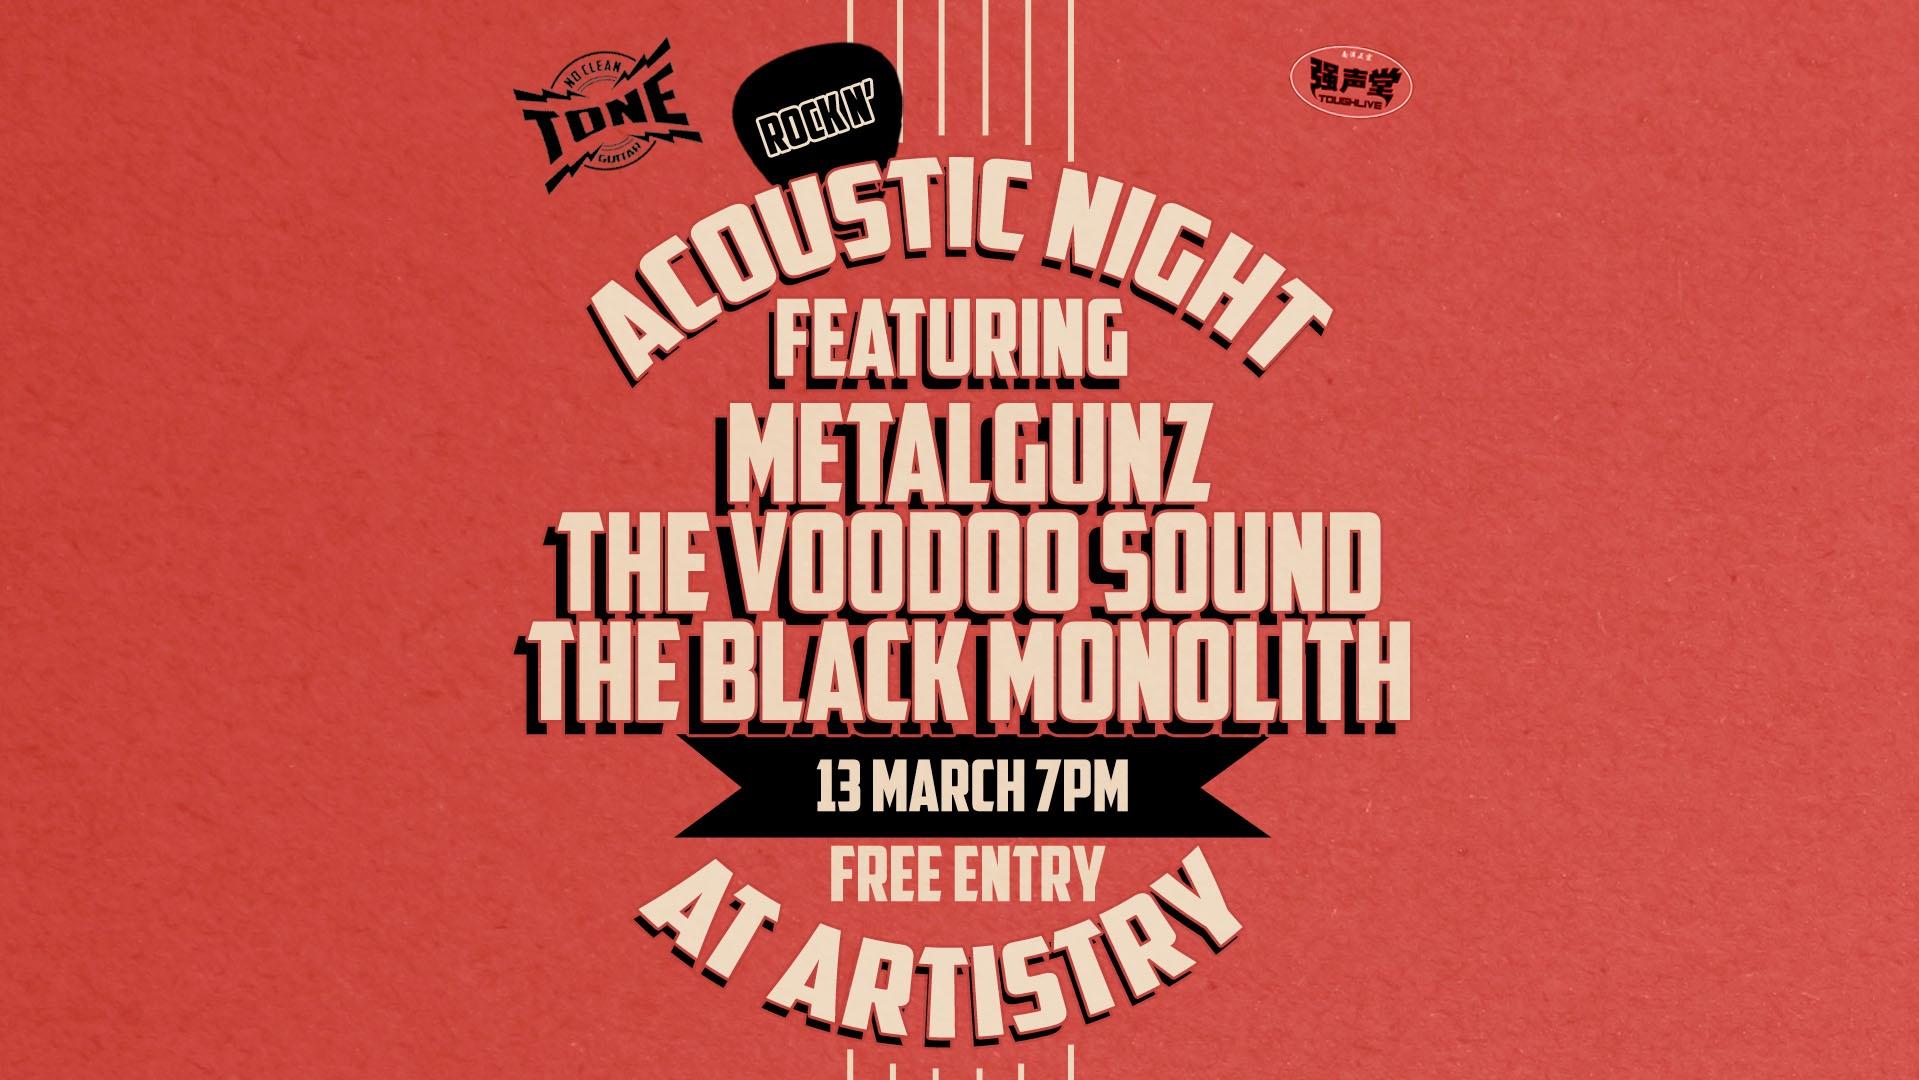 Rock n' Acoustic Night at Artistry